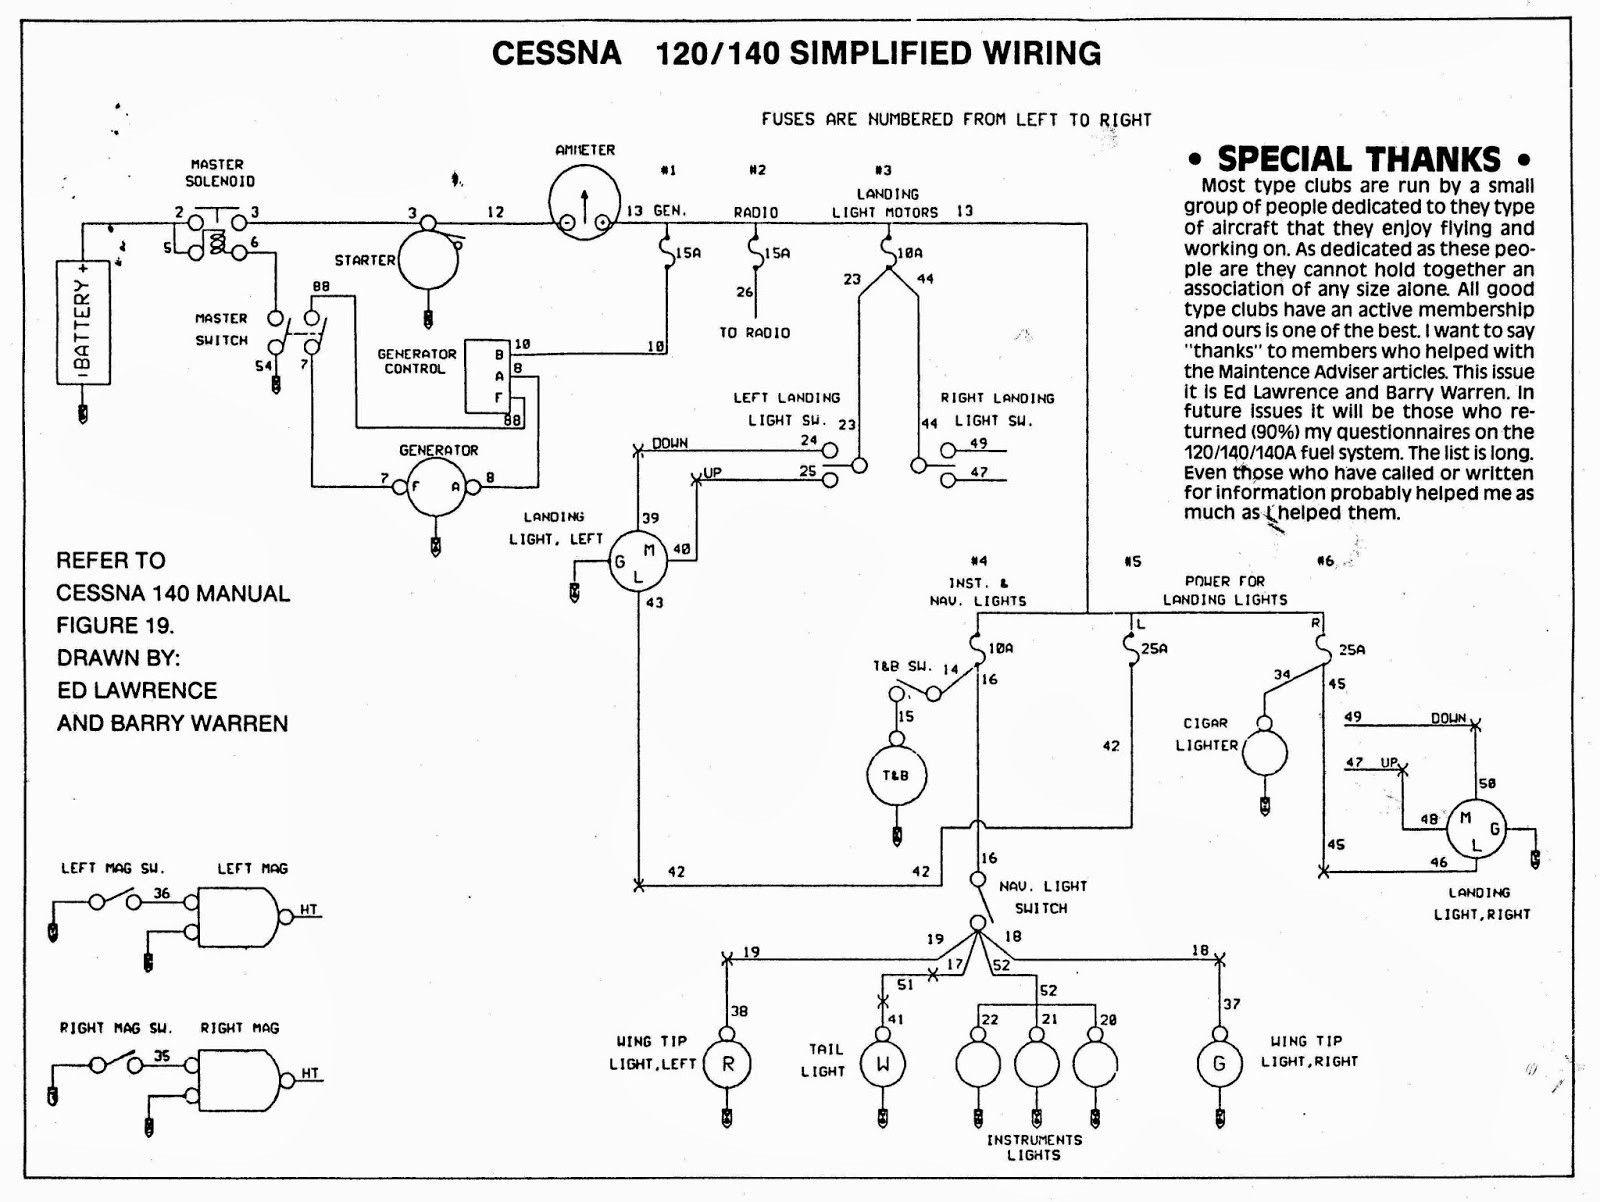 Unique Wiring Diagram Manual Aircraft